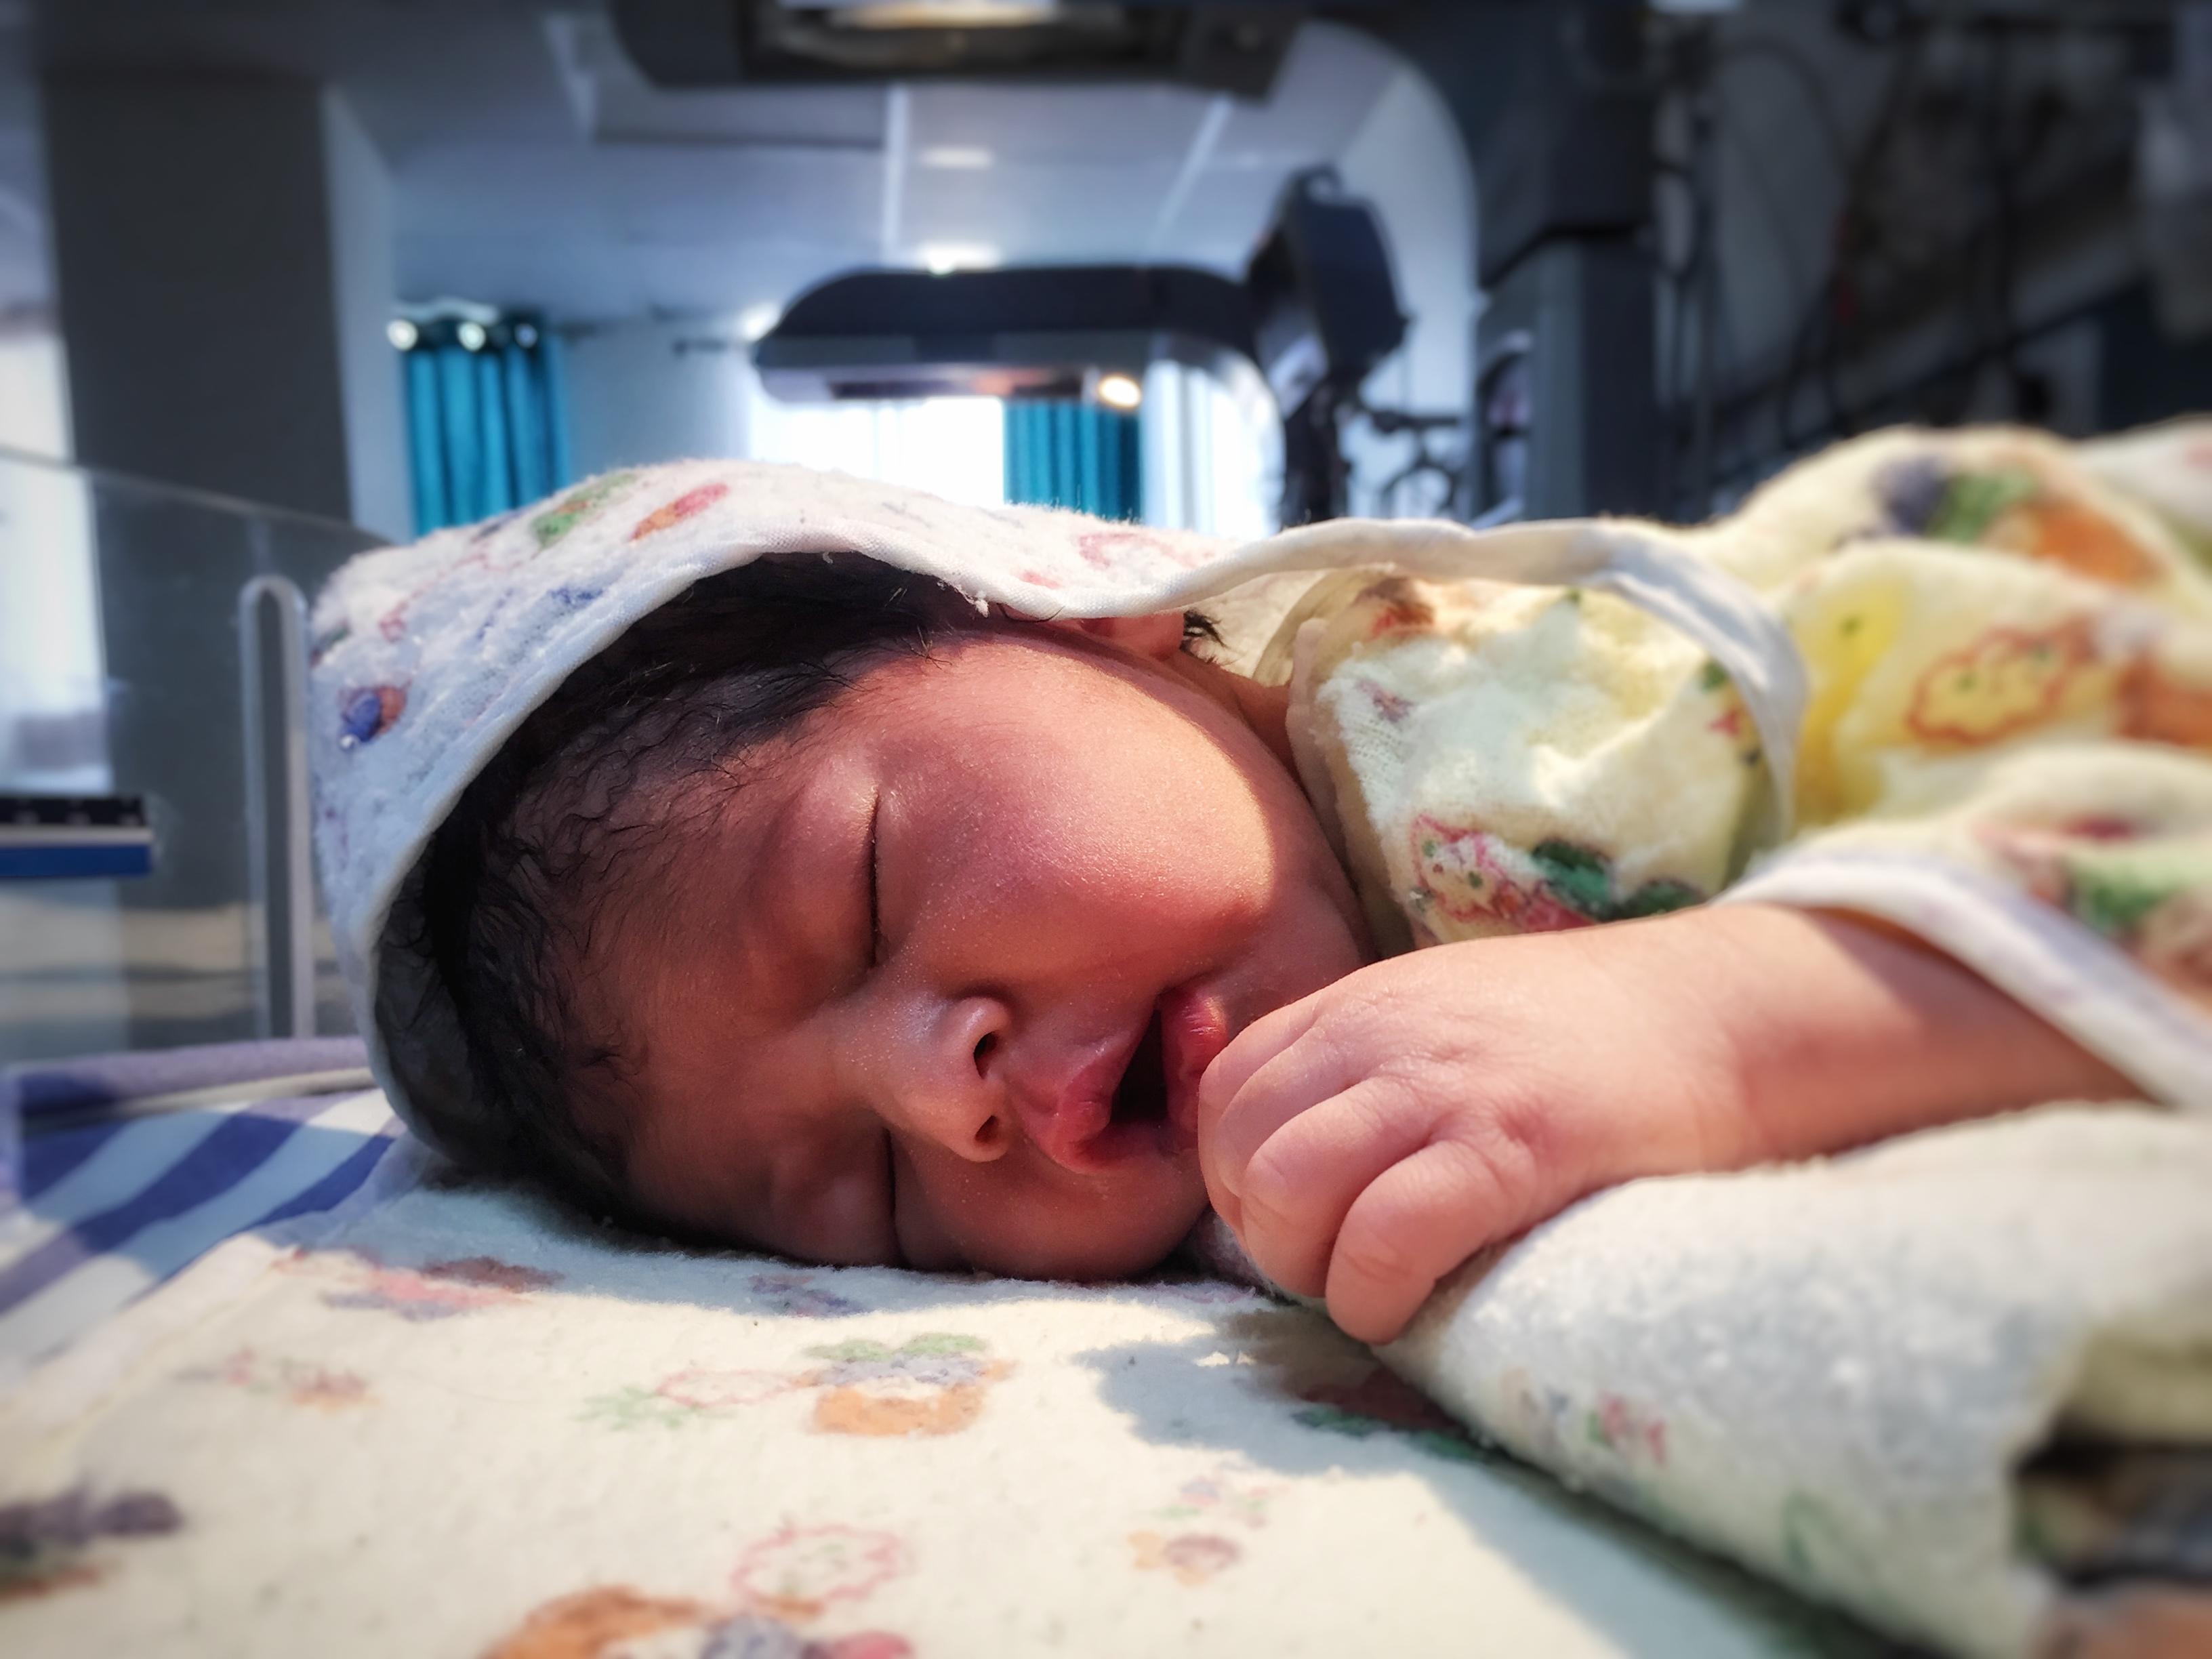 Newborn in nursery